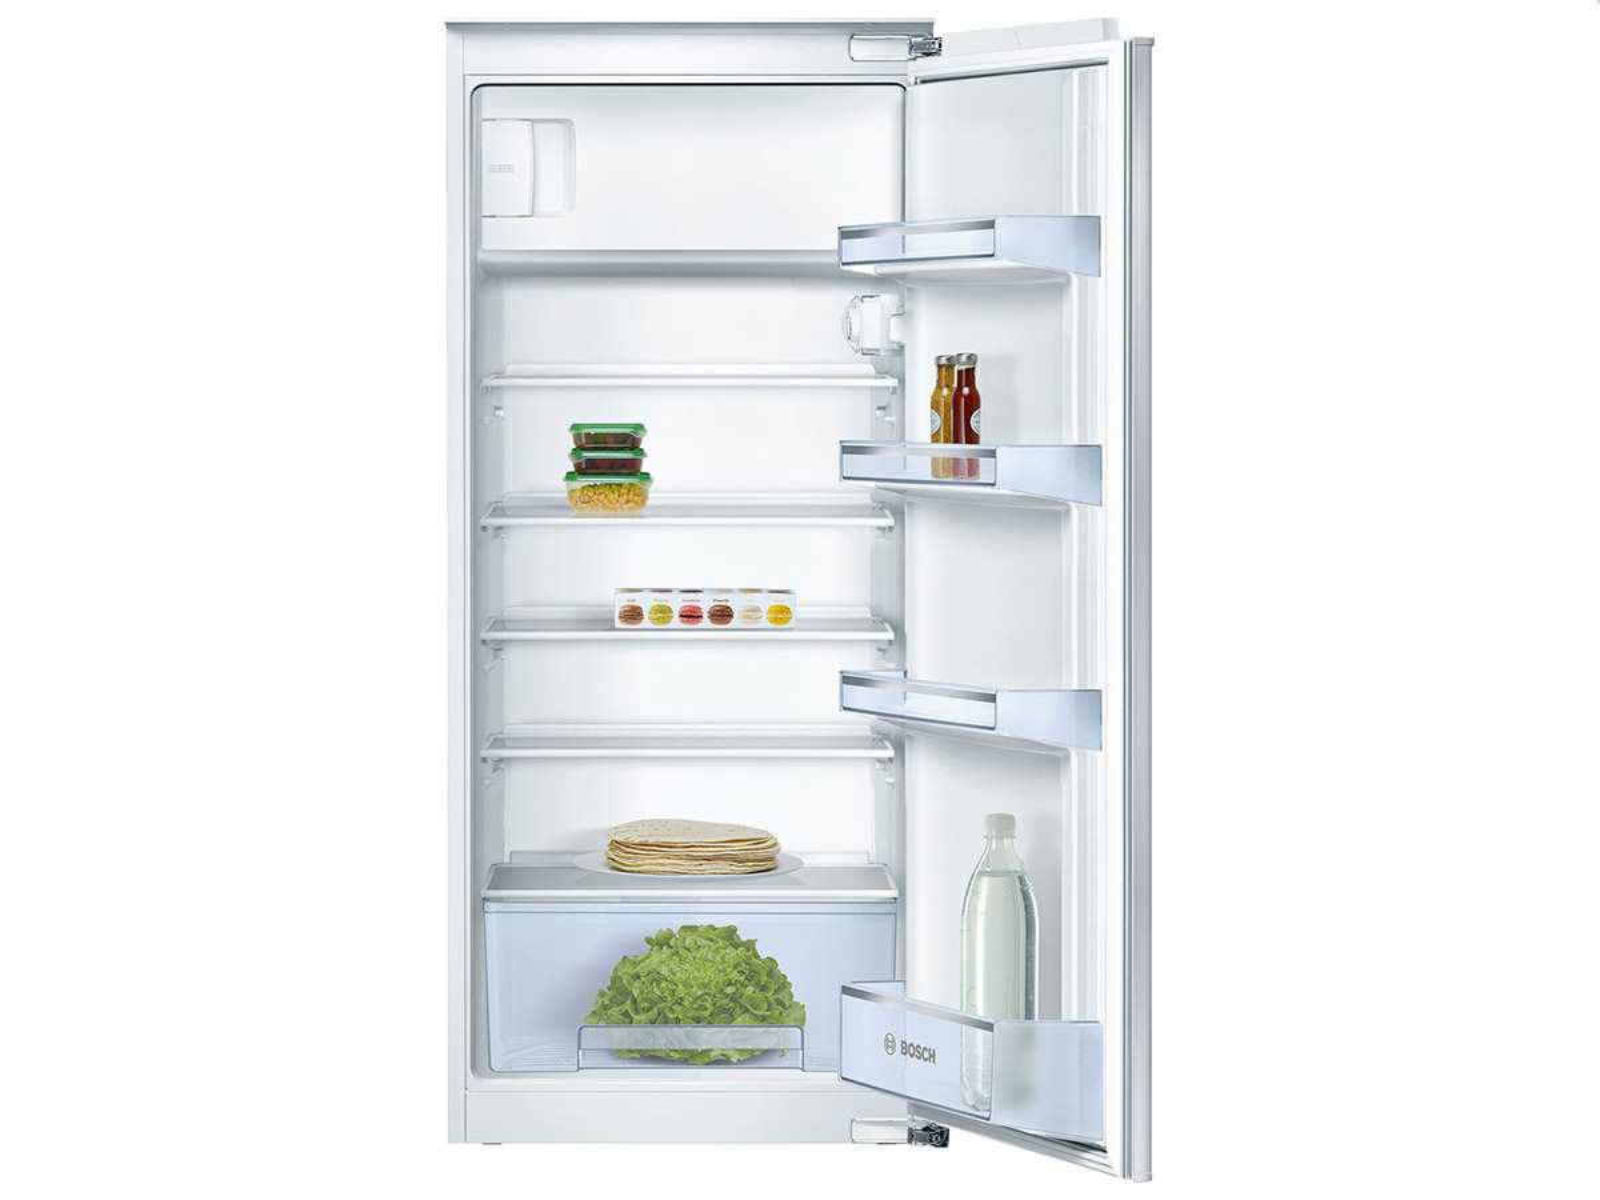 Bosch KIL24V60 Einbaukühlschrank